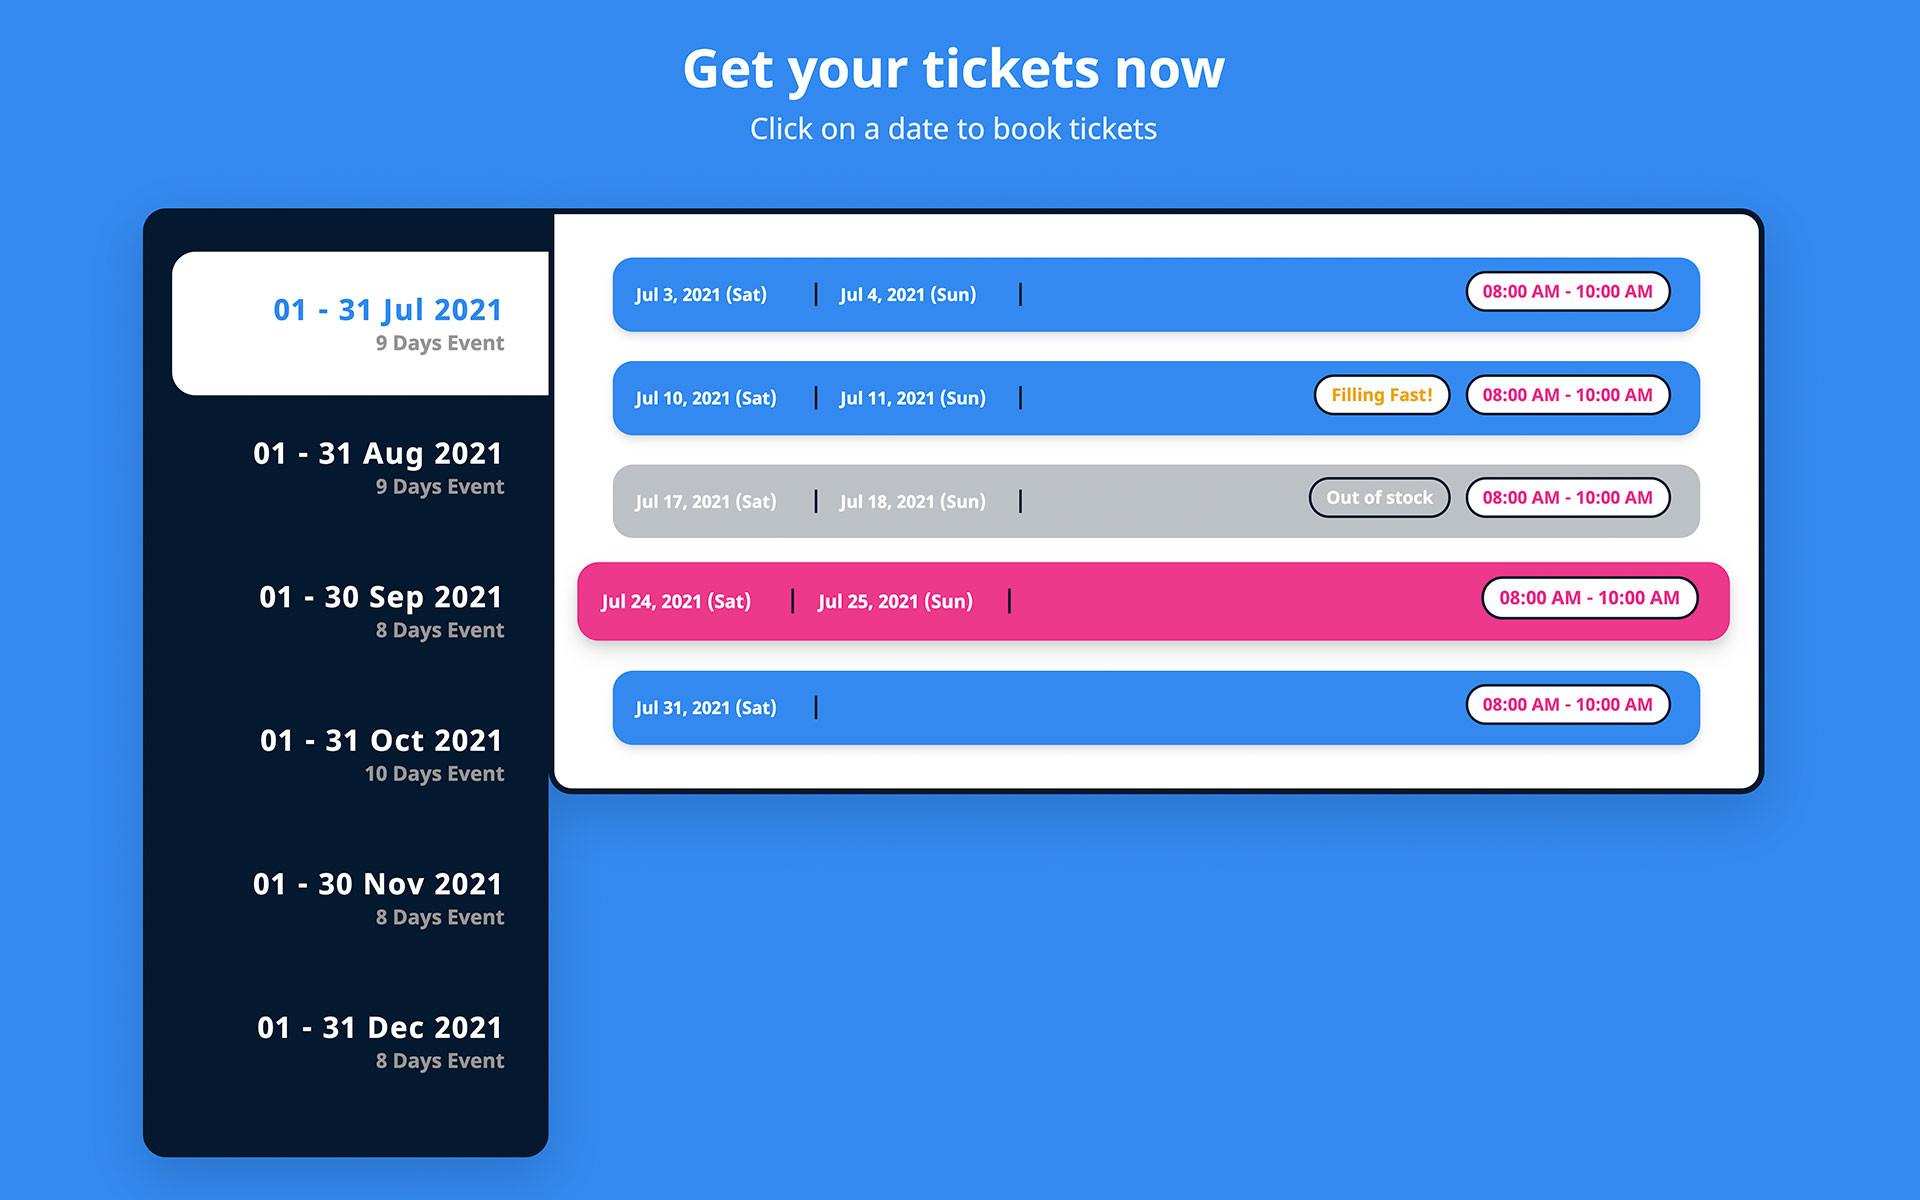 Timeslots availability check